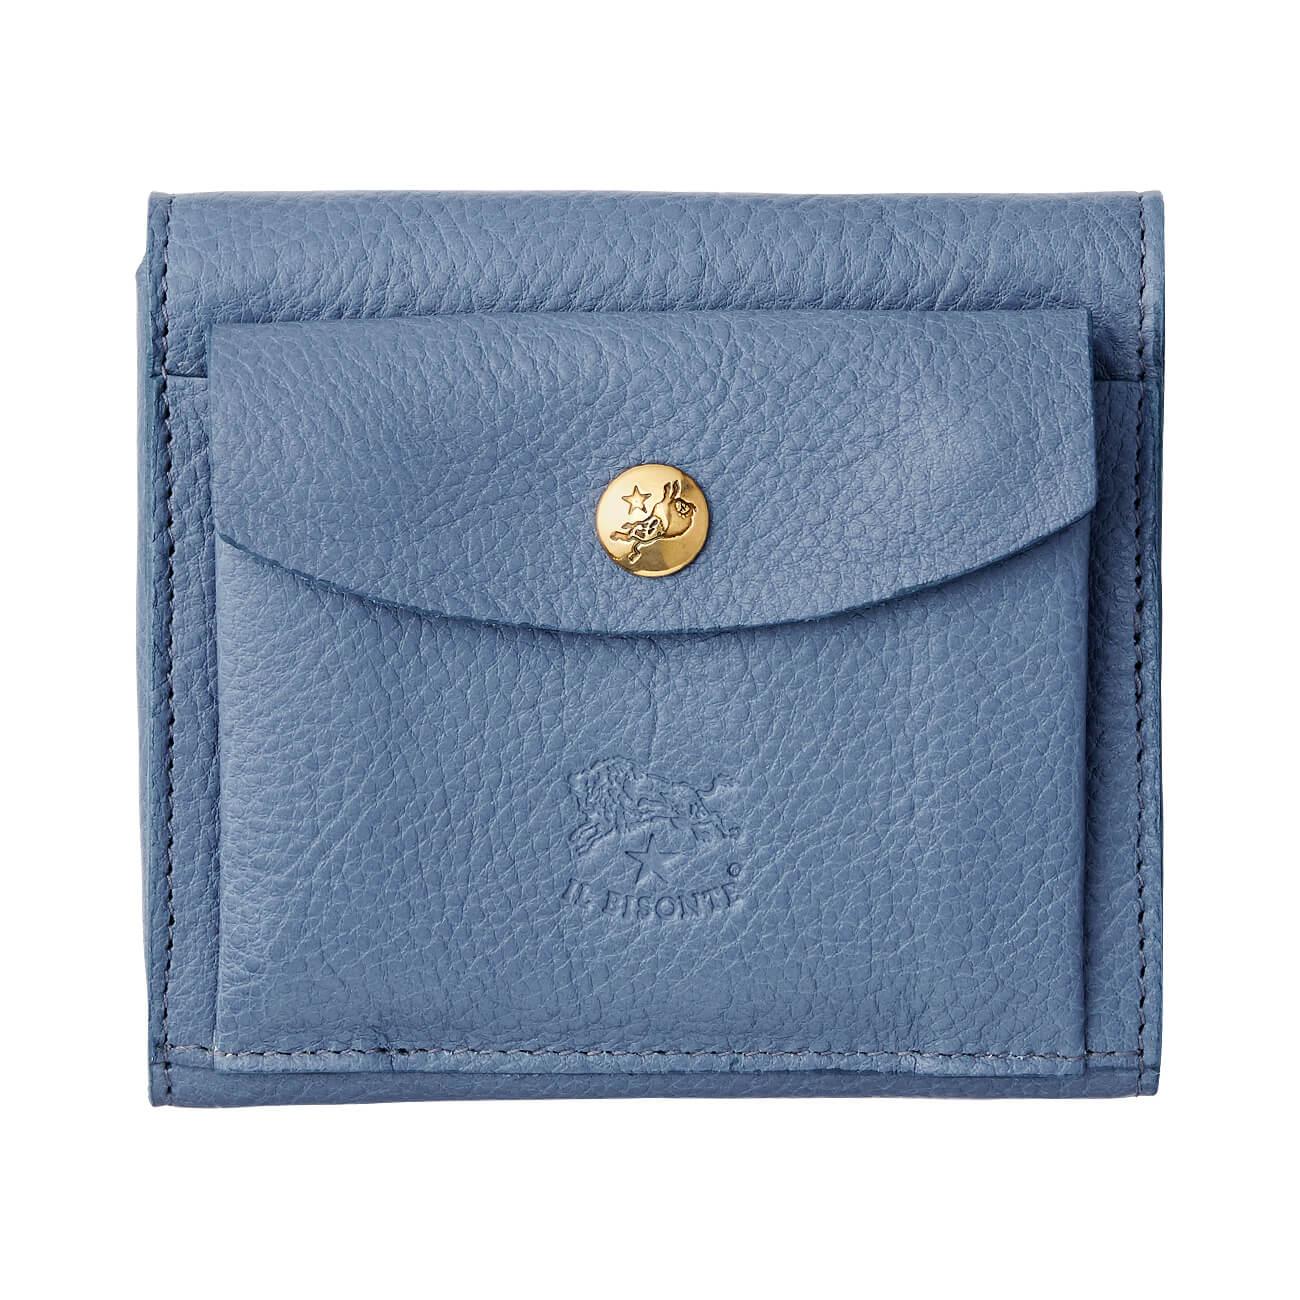 IL BISONTE (イル ビゾンテ) 日本公式オンラインストア コンパクト財布 54192309140